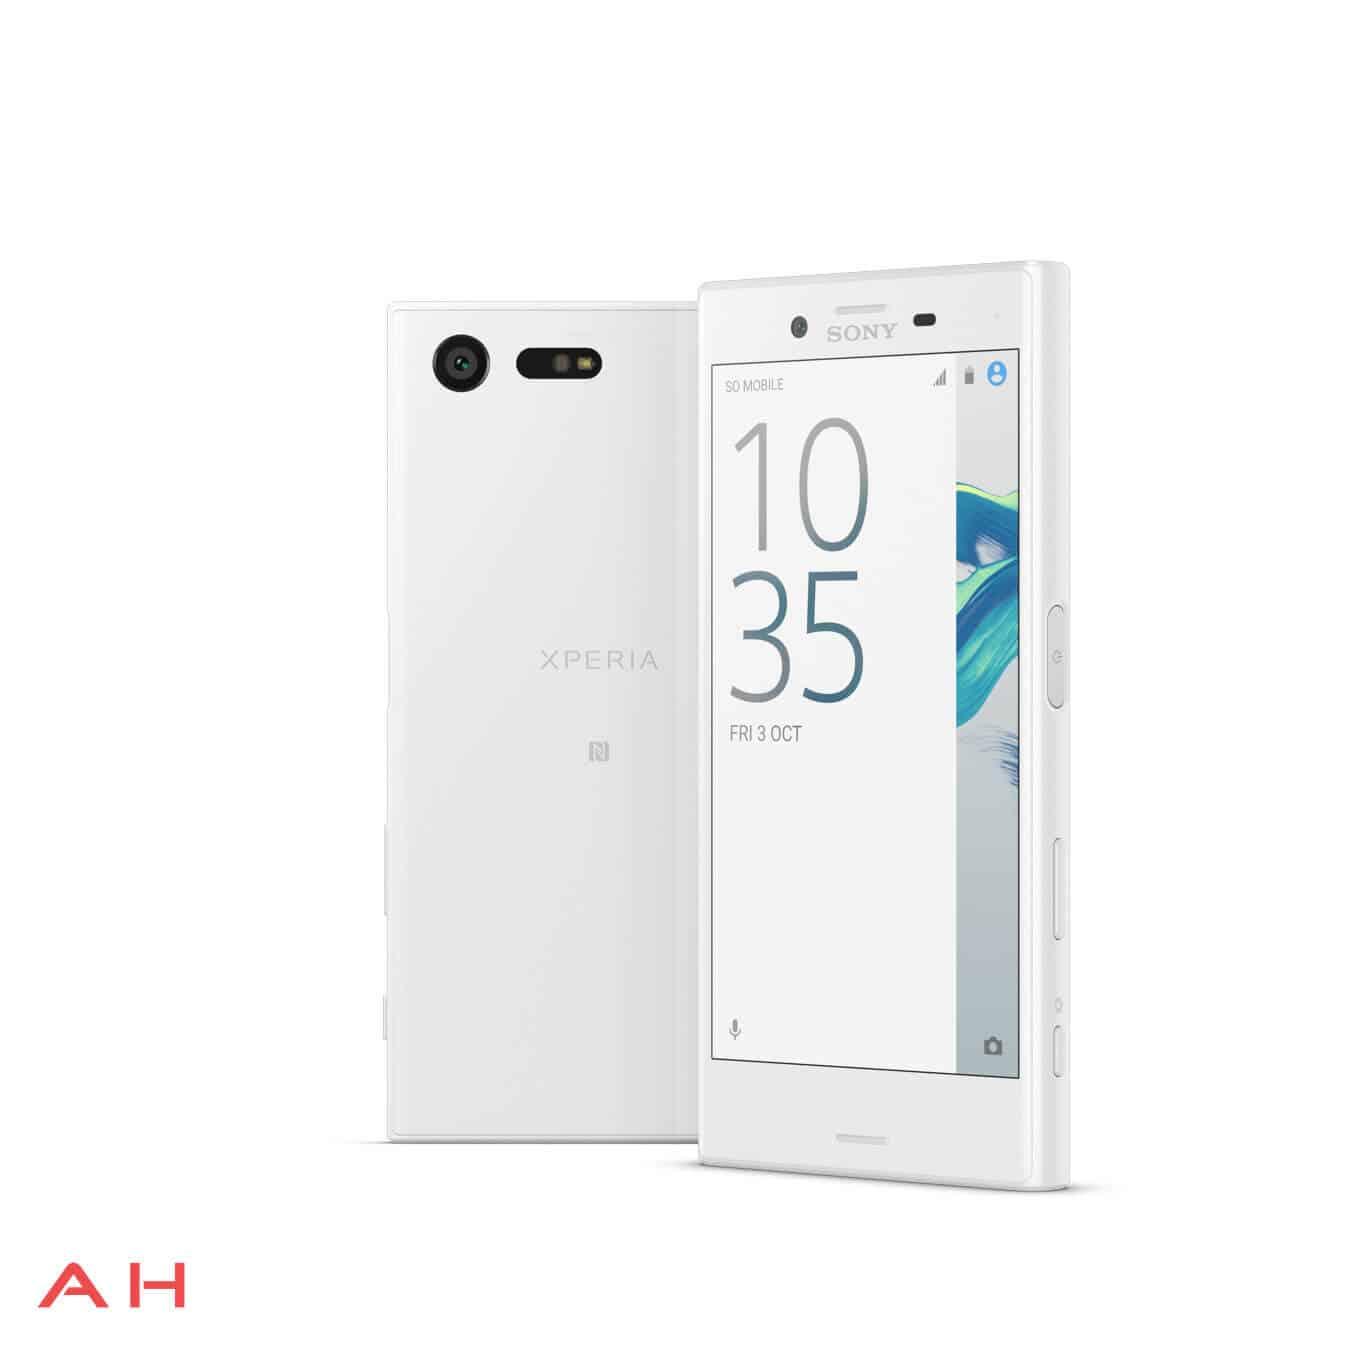 Sony Xperia X Compact AH 8